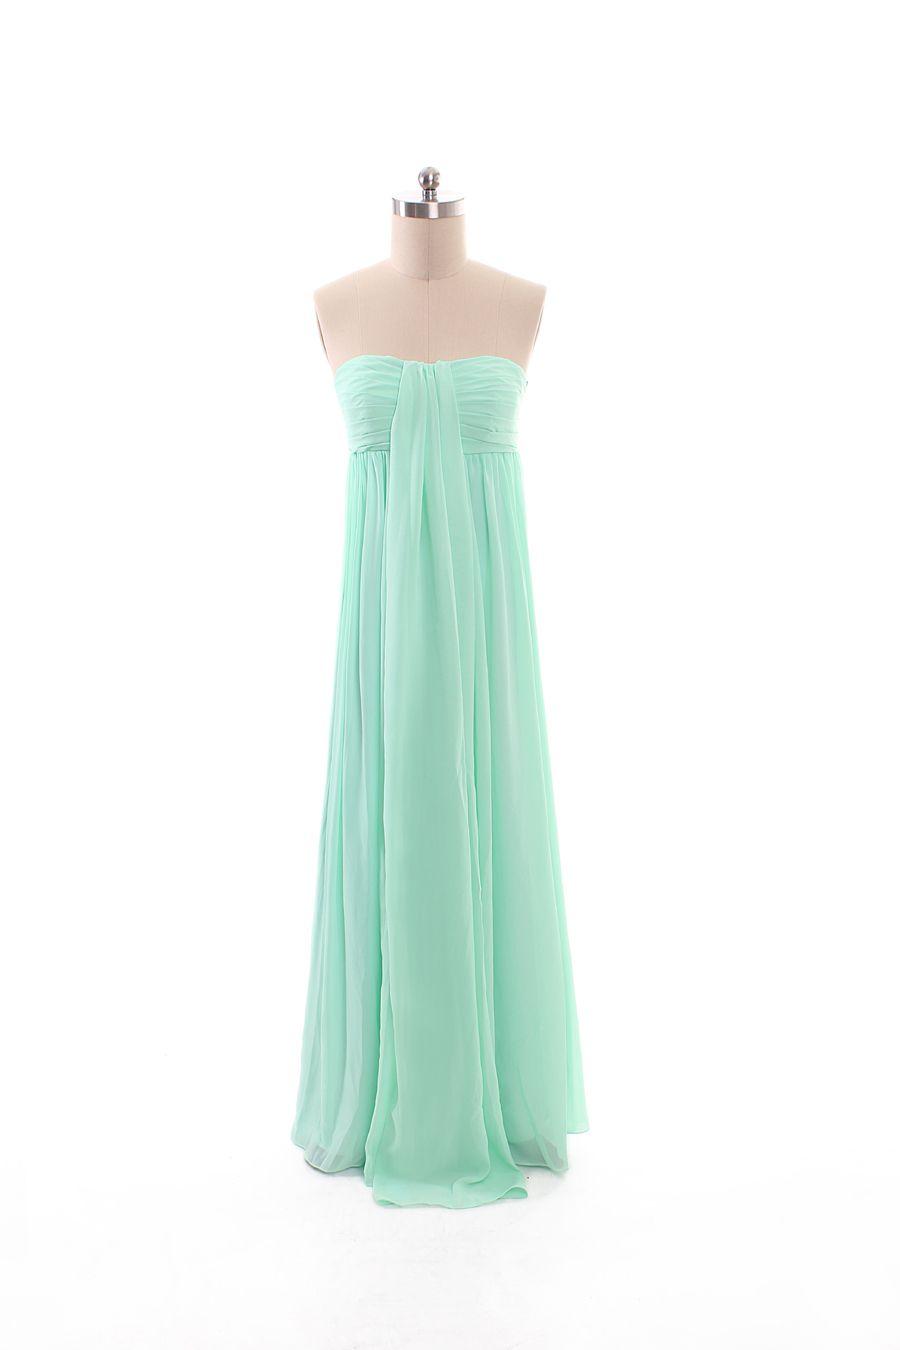 Turquoise wedding dresses  Beauty sleeveless chiffon bridesmaid gown  Clothing  Pinterest